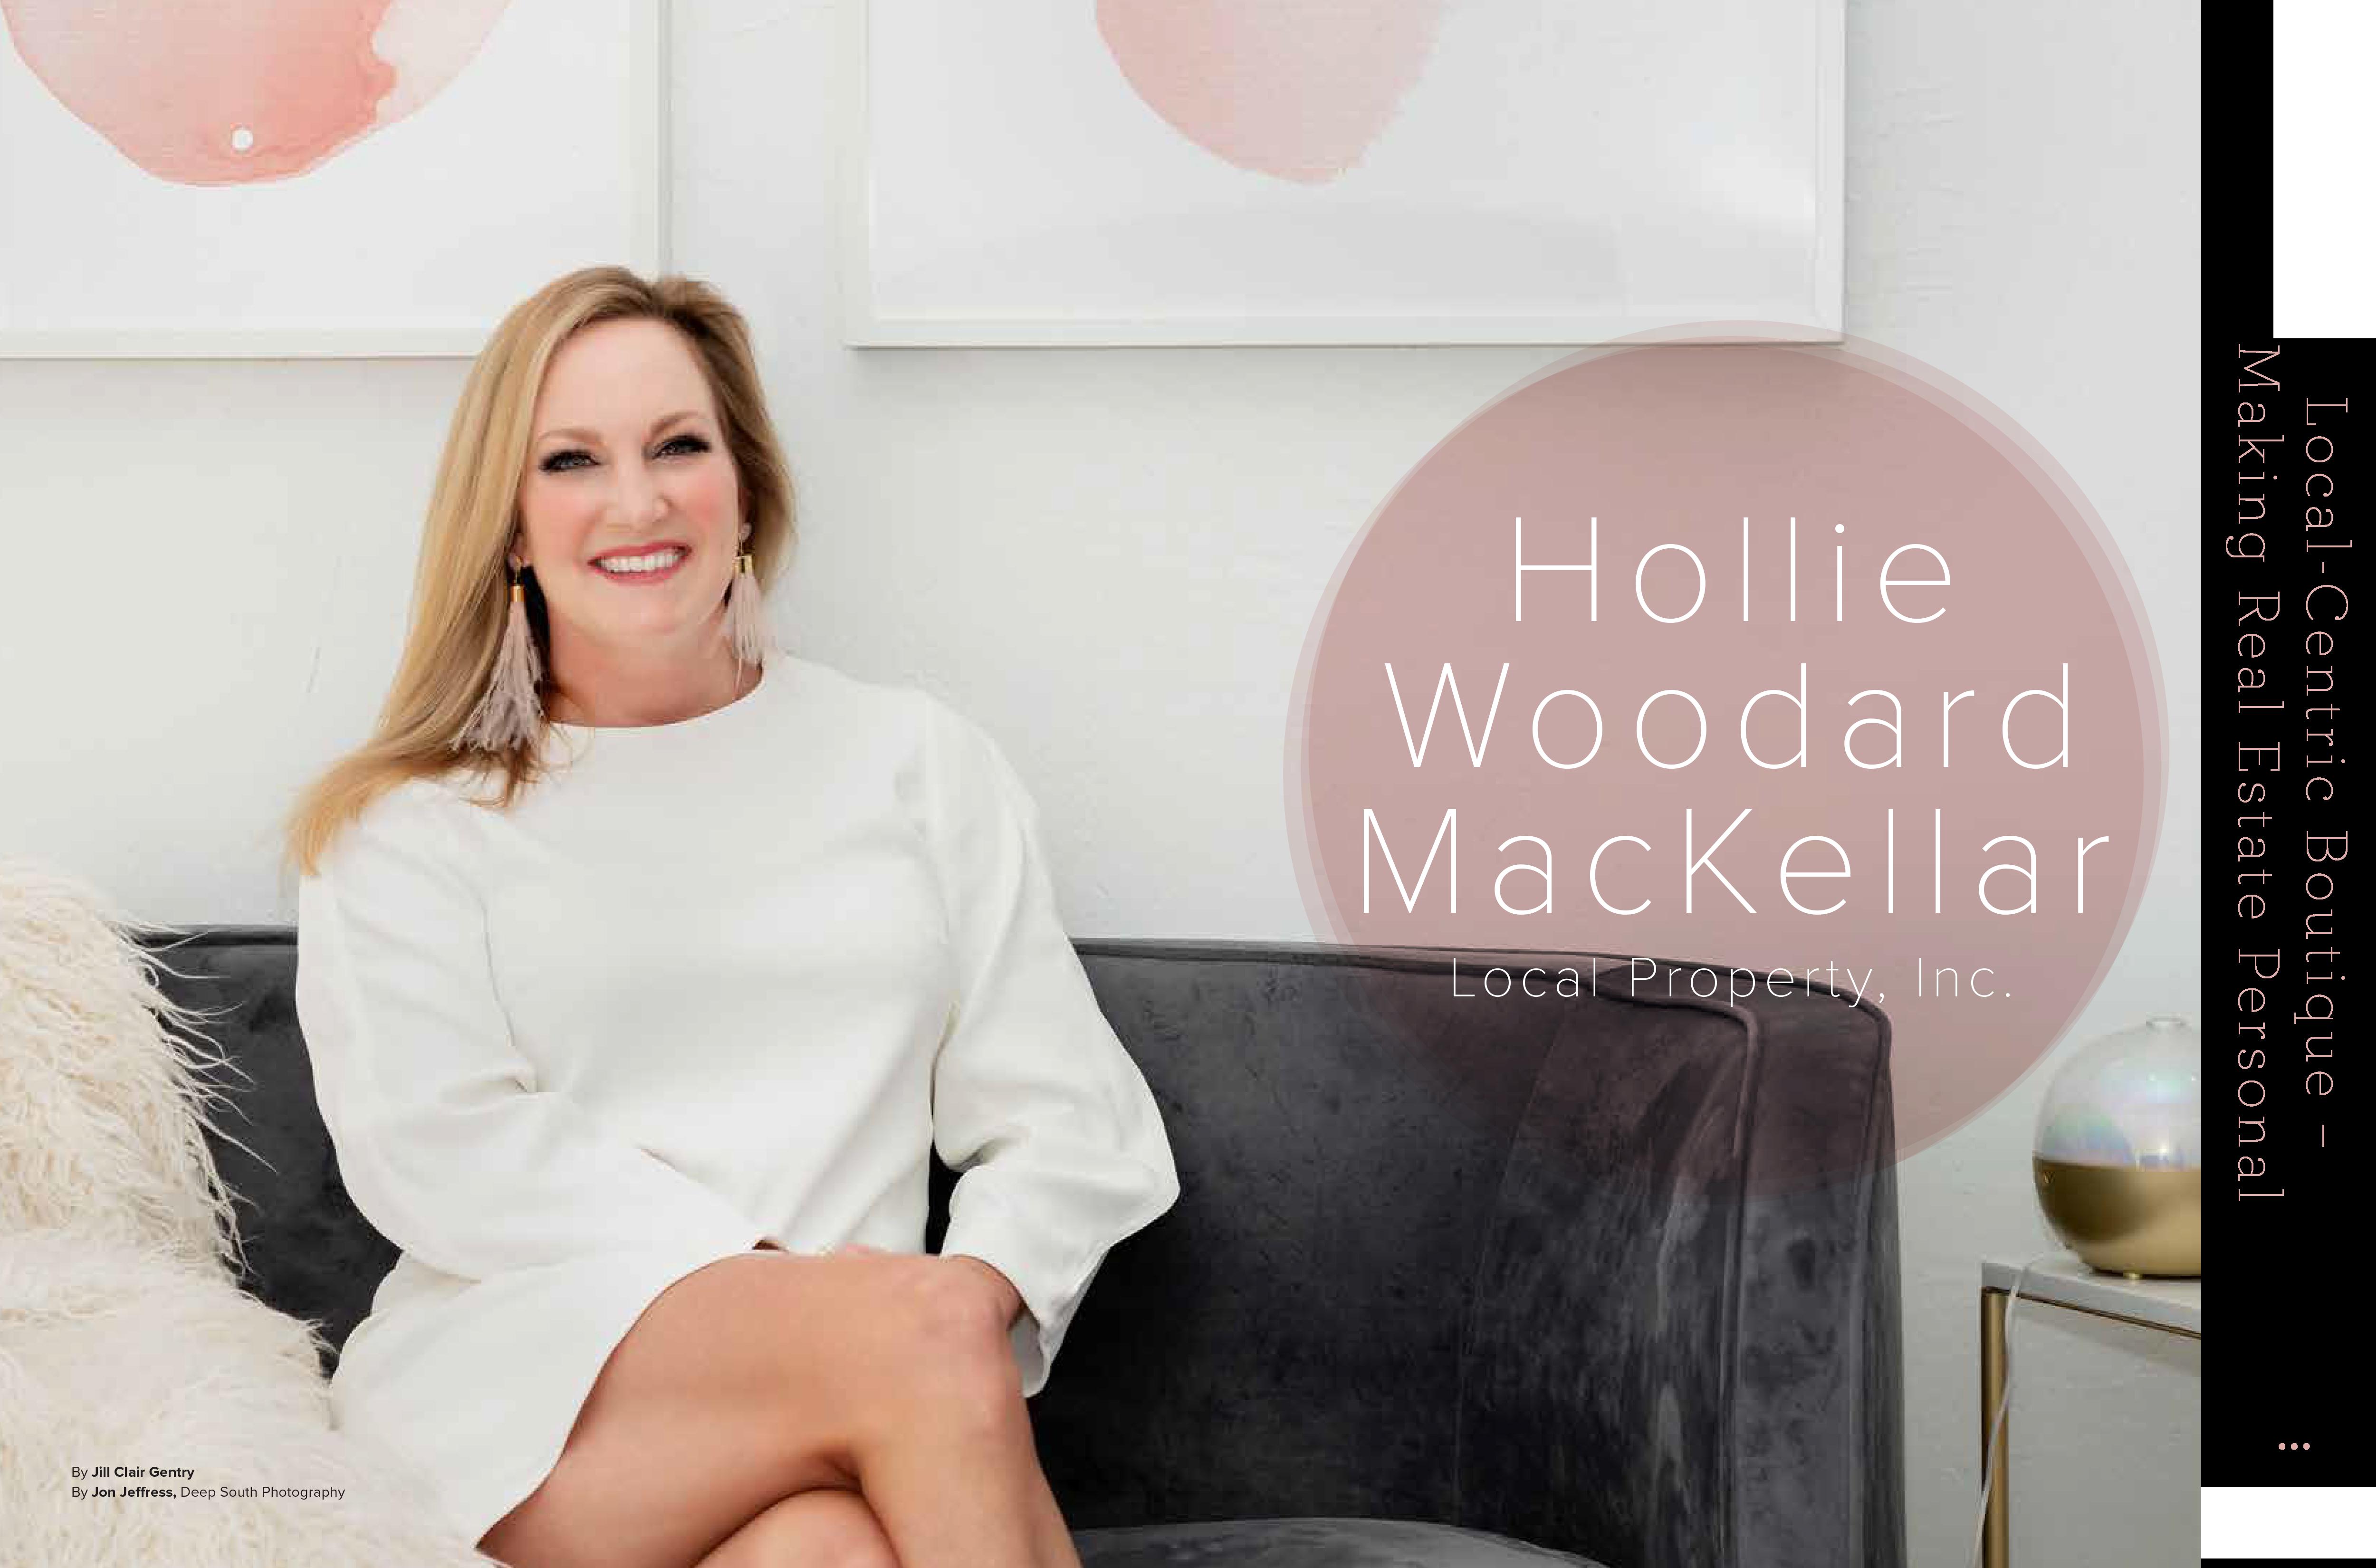 Hollie-Woodard-Mac-Kellar-1